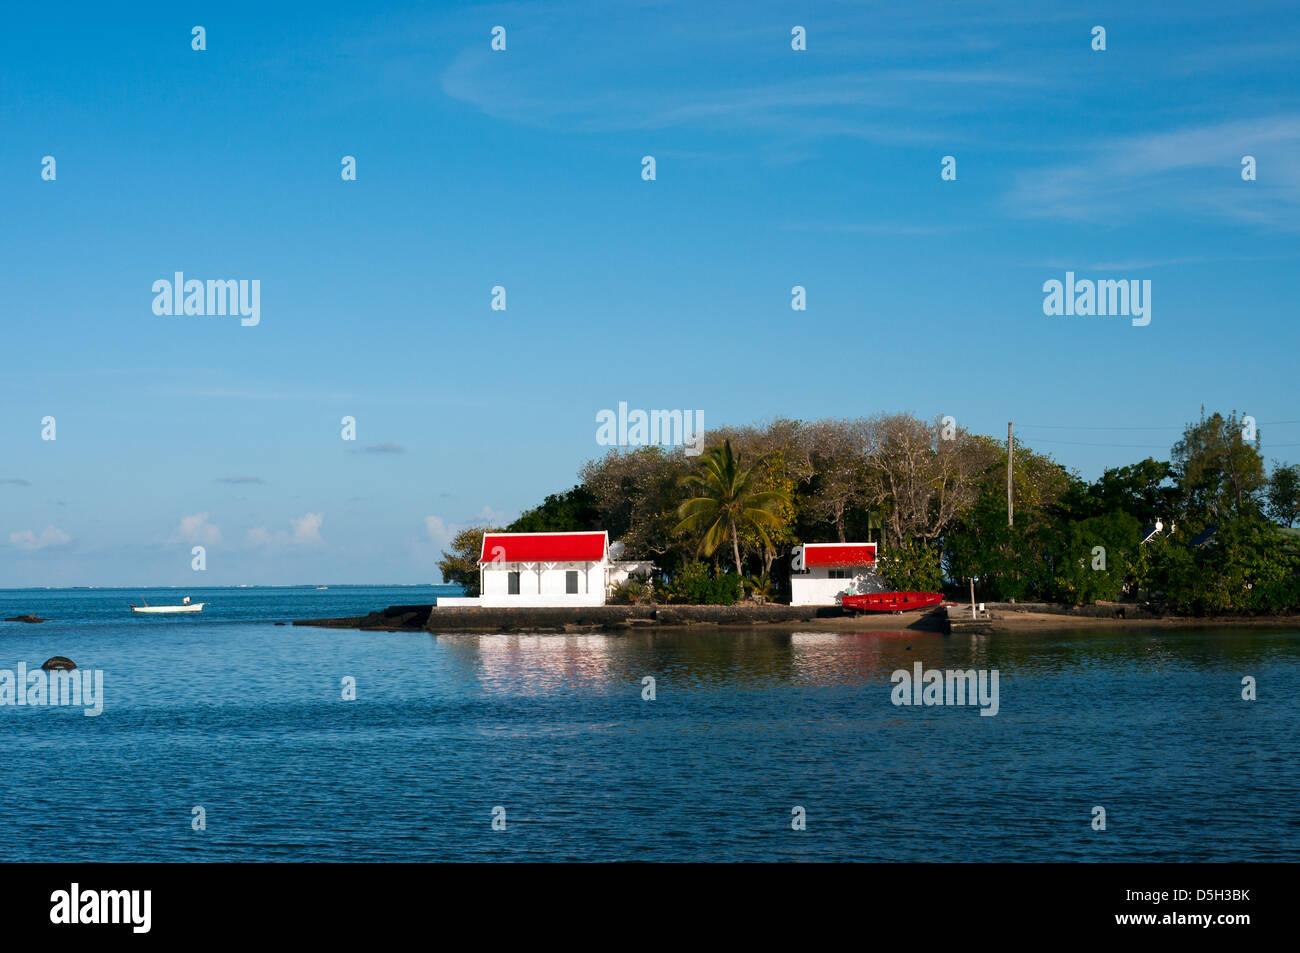 mahebourg, mauritius - Stock Image